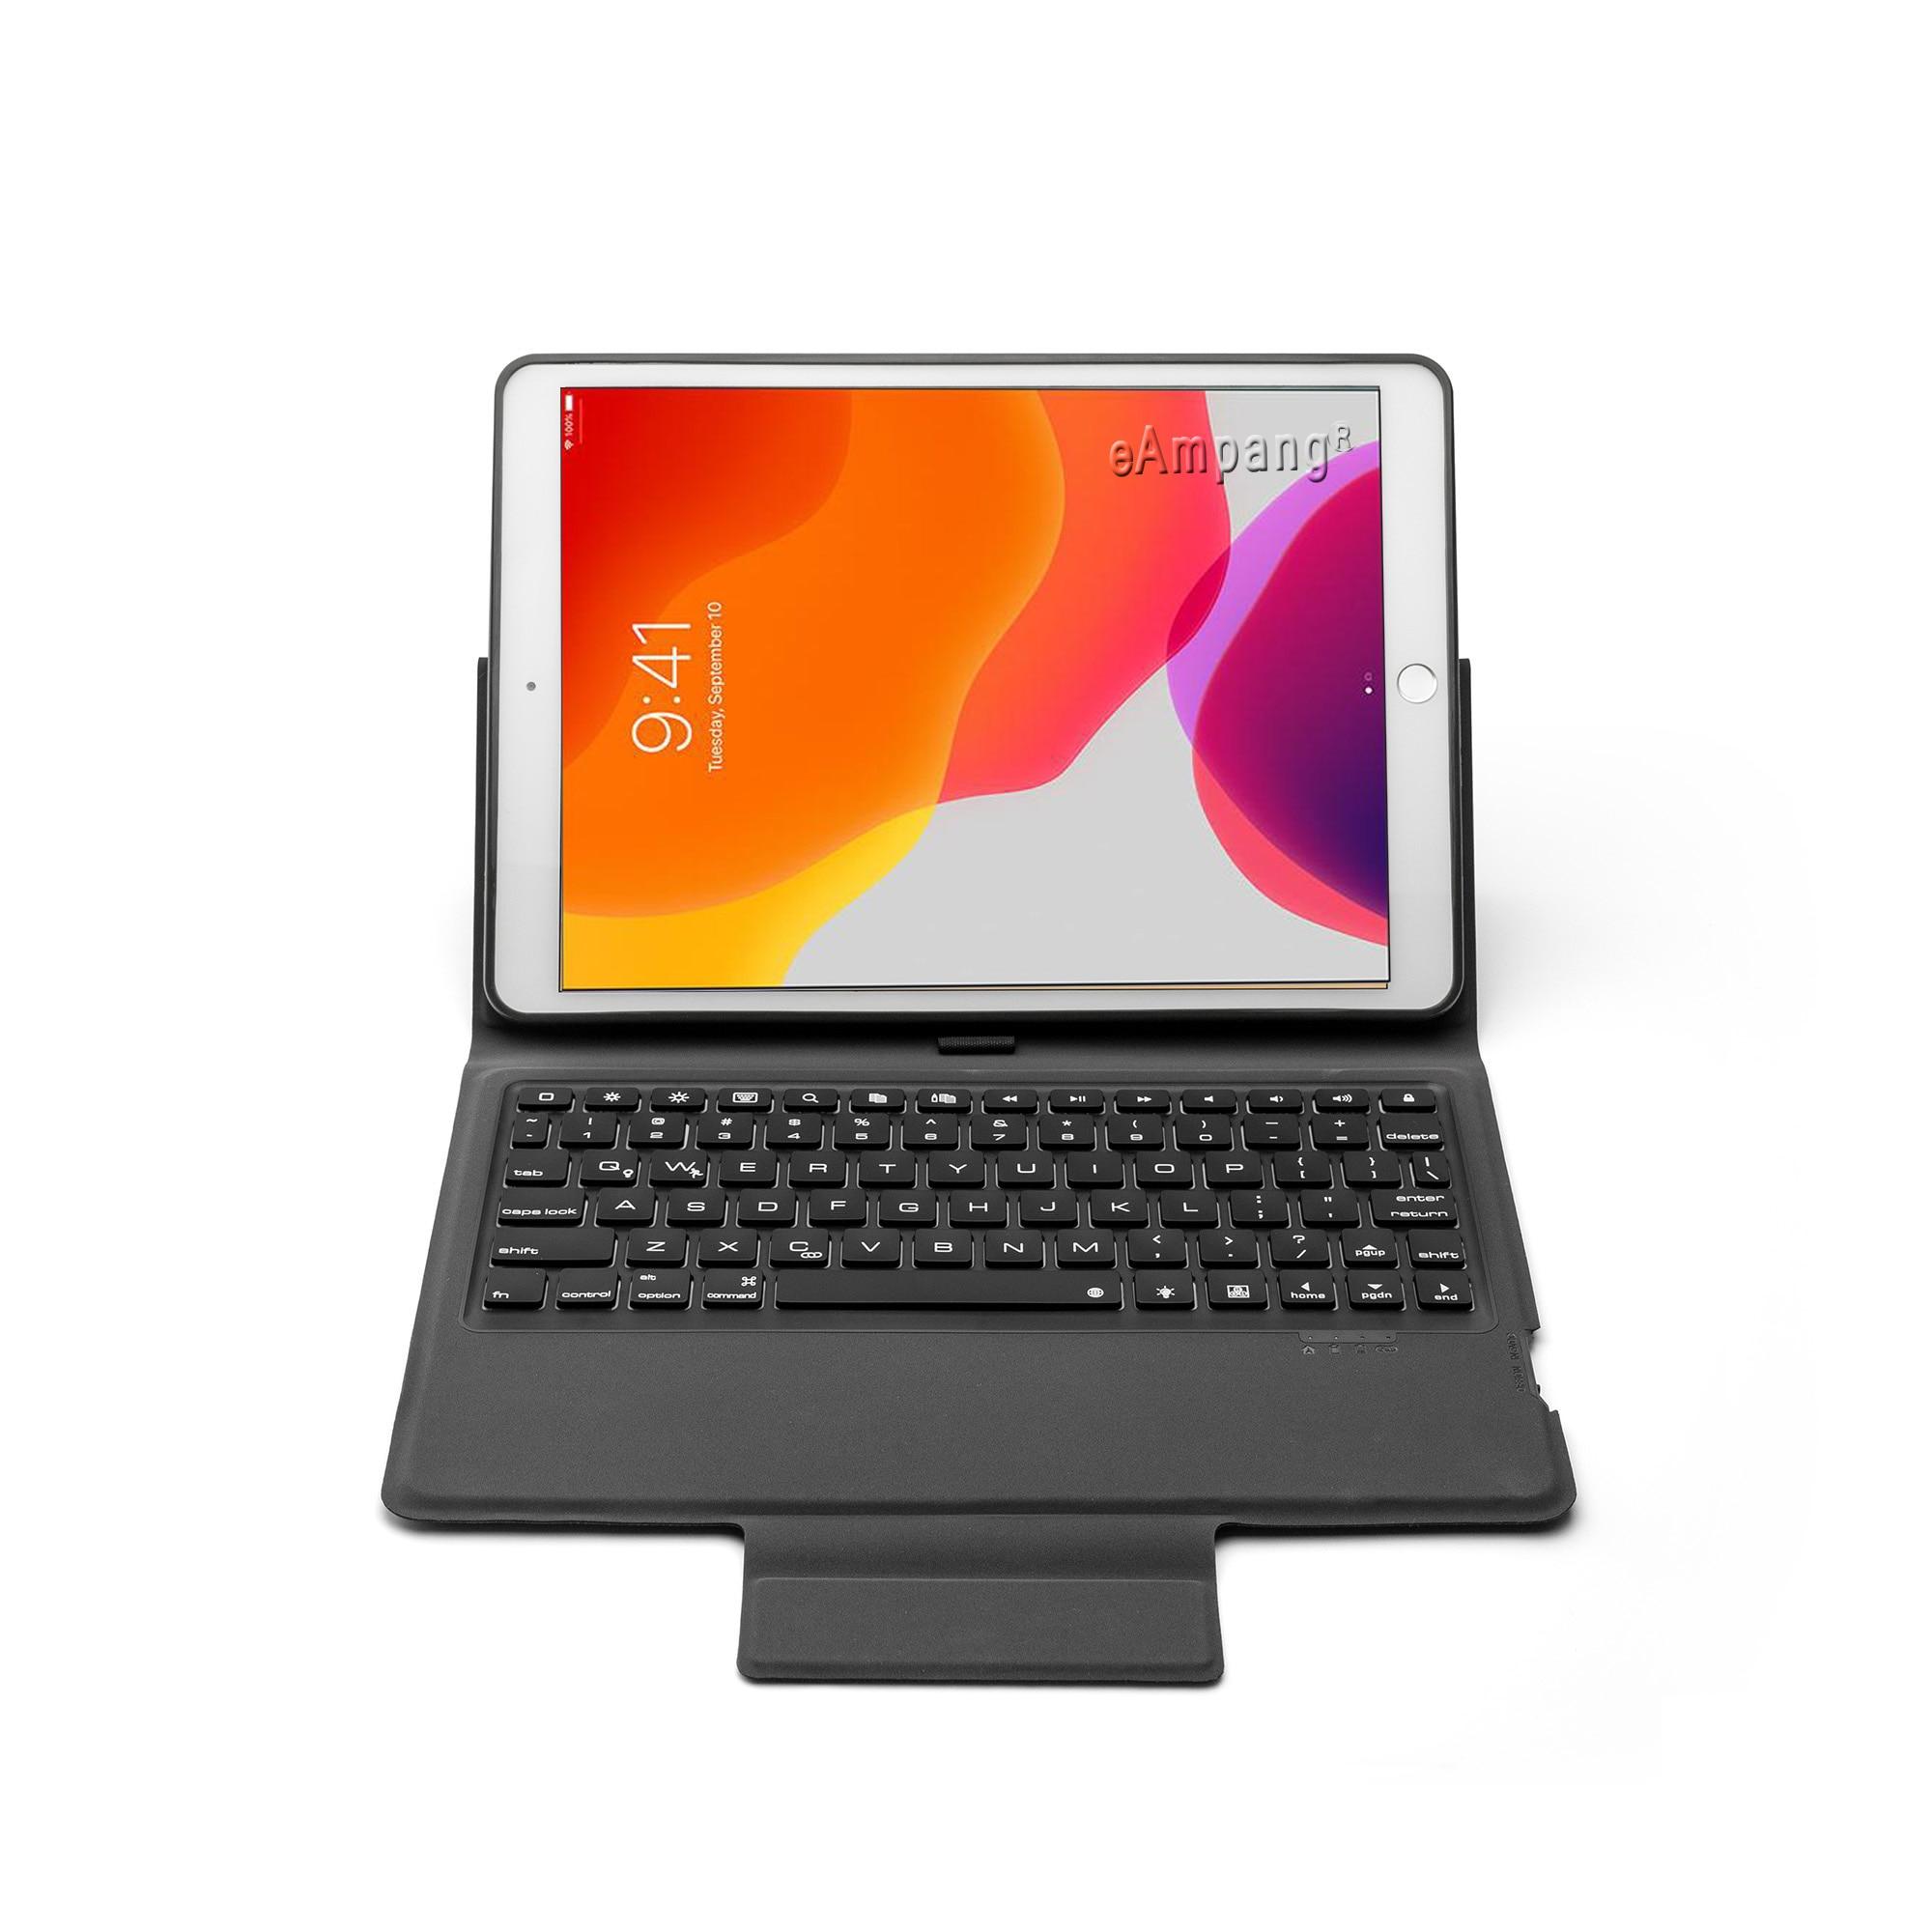 Image 3 - 7 Backlit Keyboard Case For Apple iPad 10.2 2019 7 7th Gen  Generation A2197 A2200 A2198 A2232 Case for iPad 10.2 Keyboard  CoverTablets